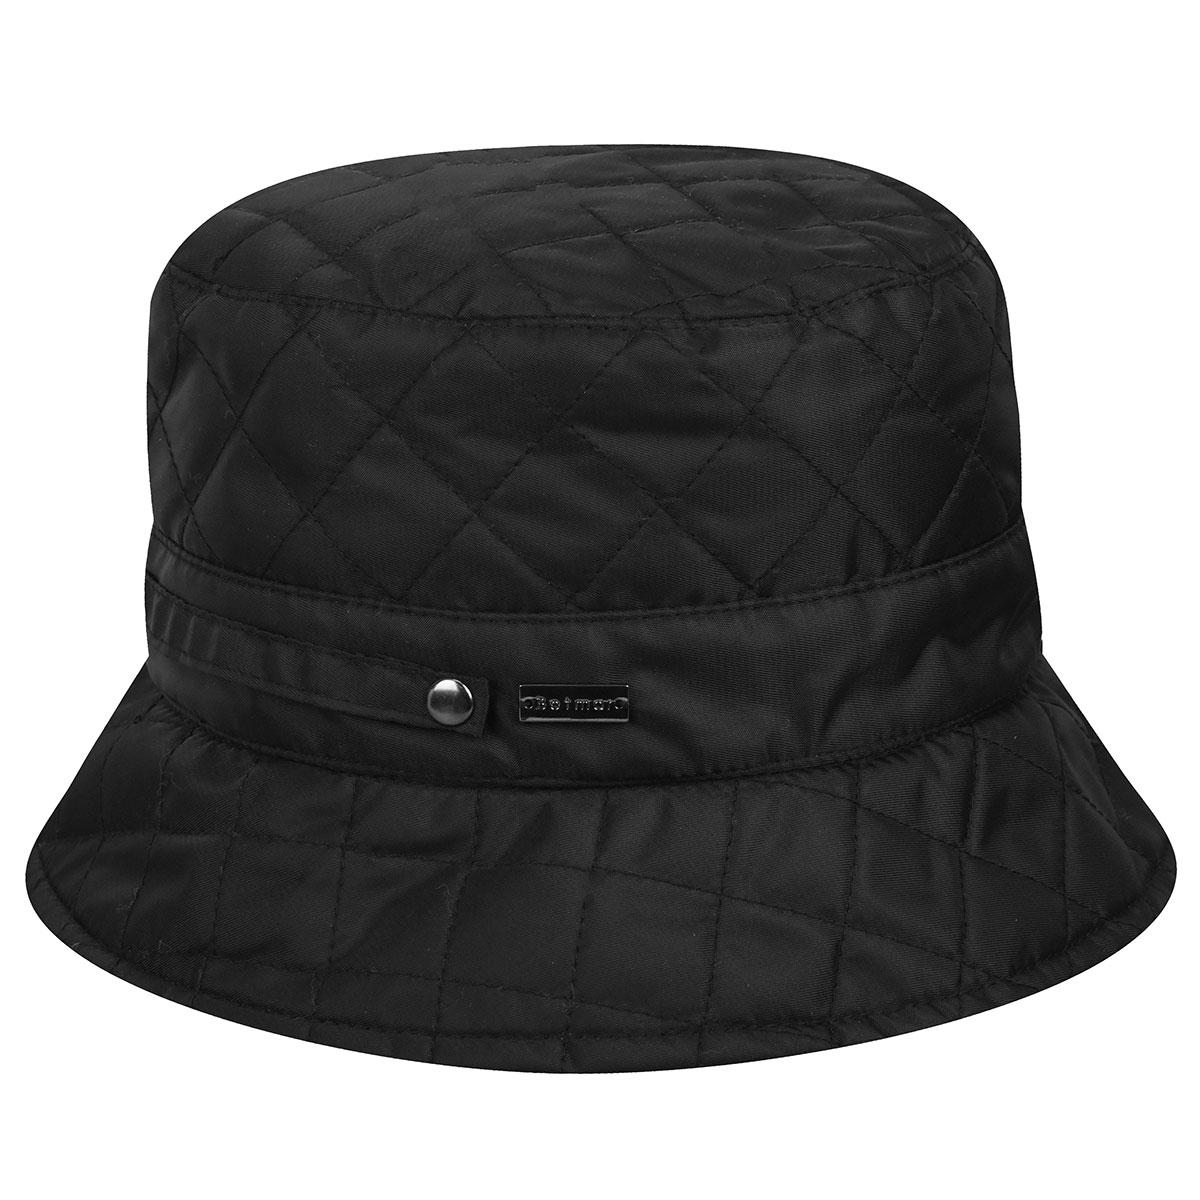 Betmar Quilted Bucket Hat in Black